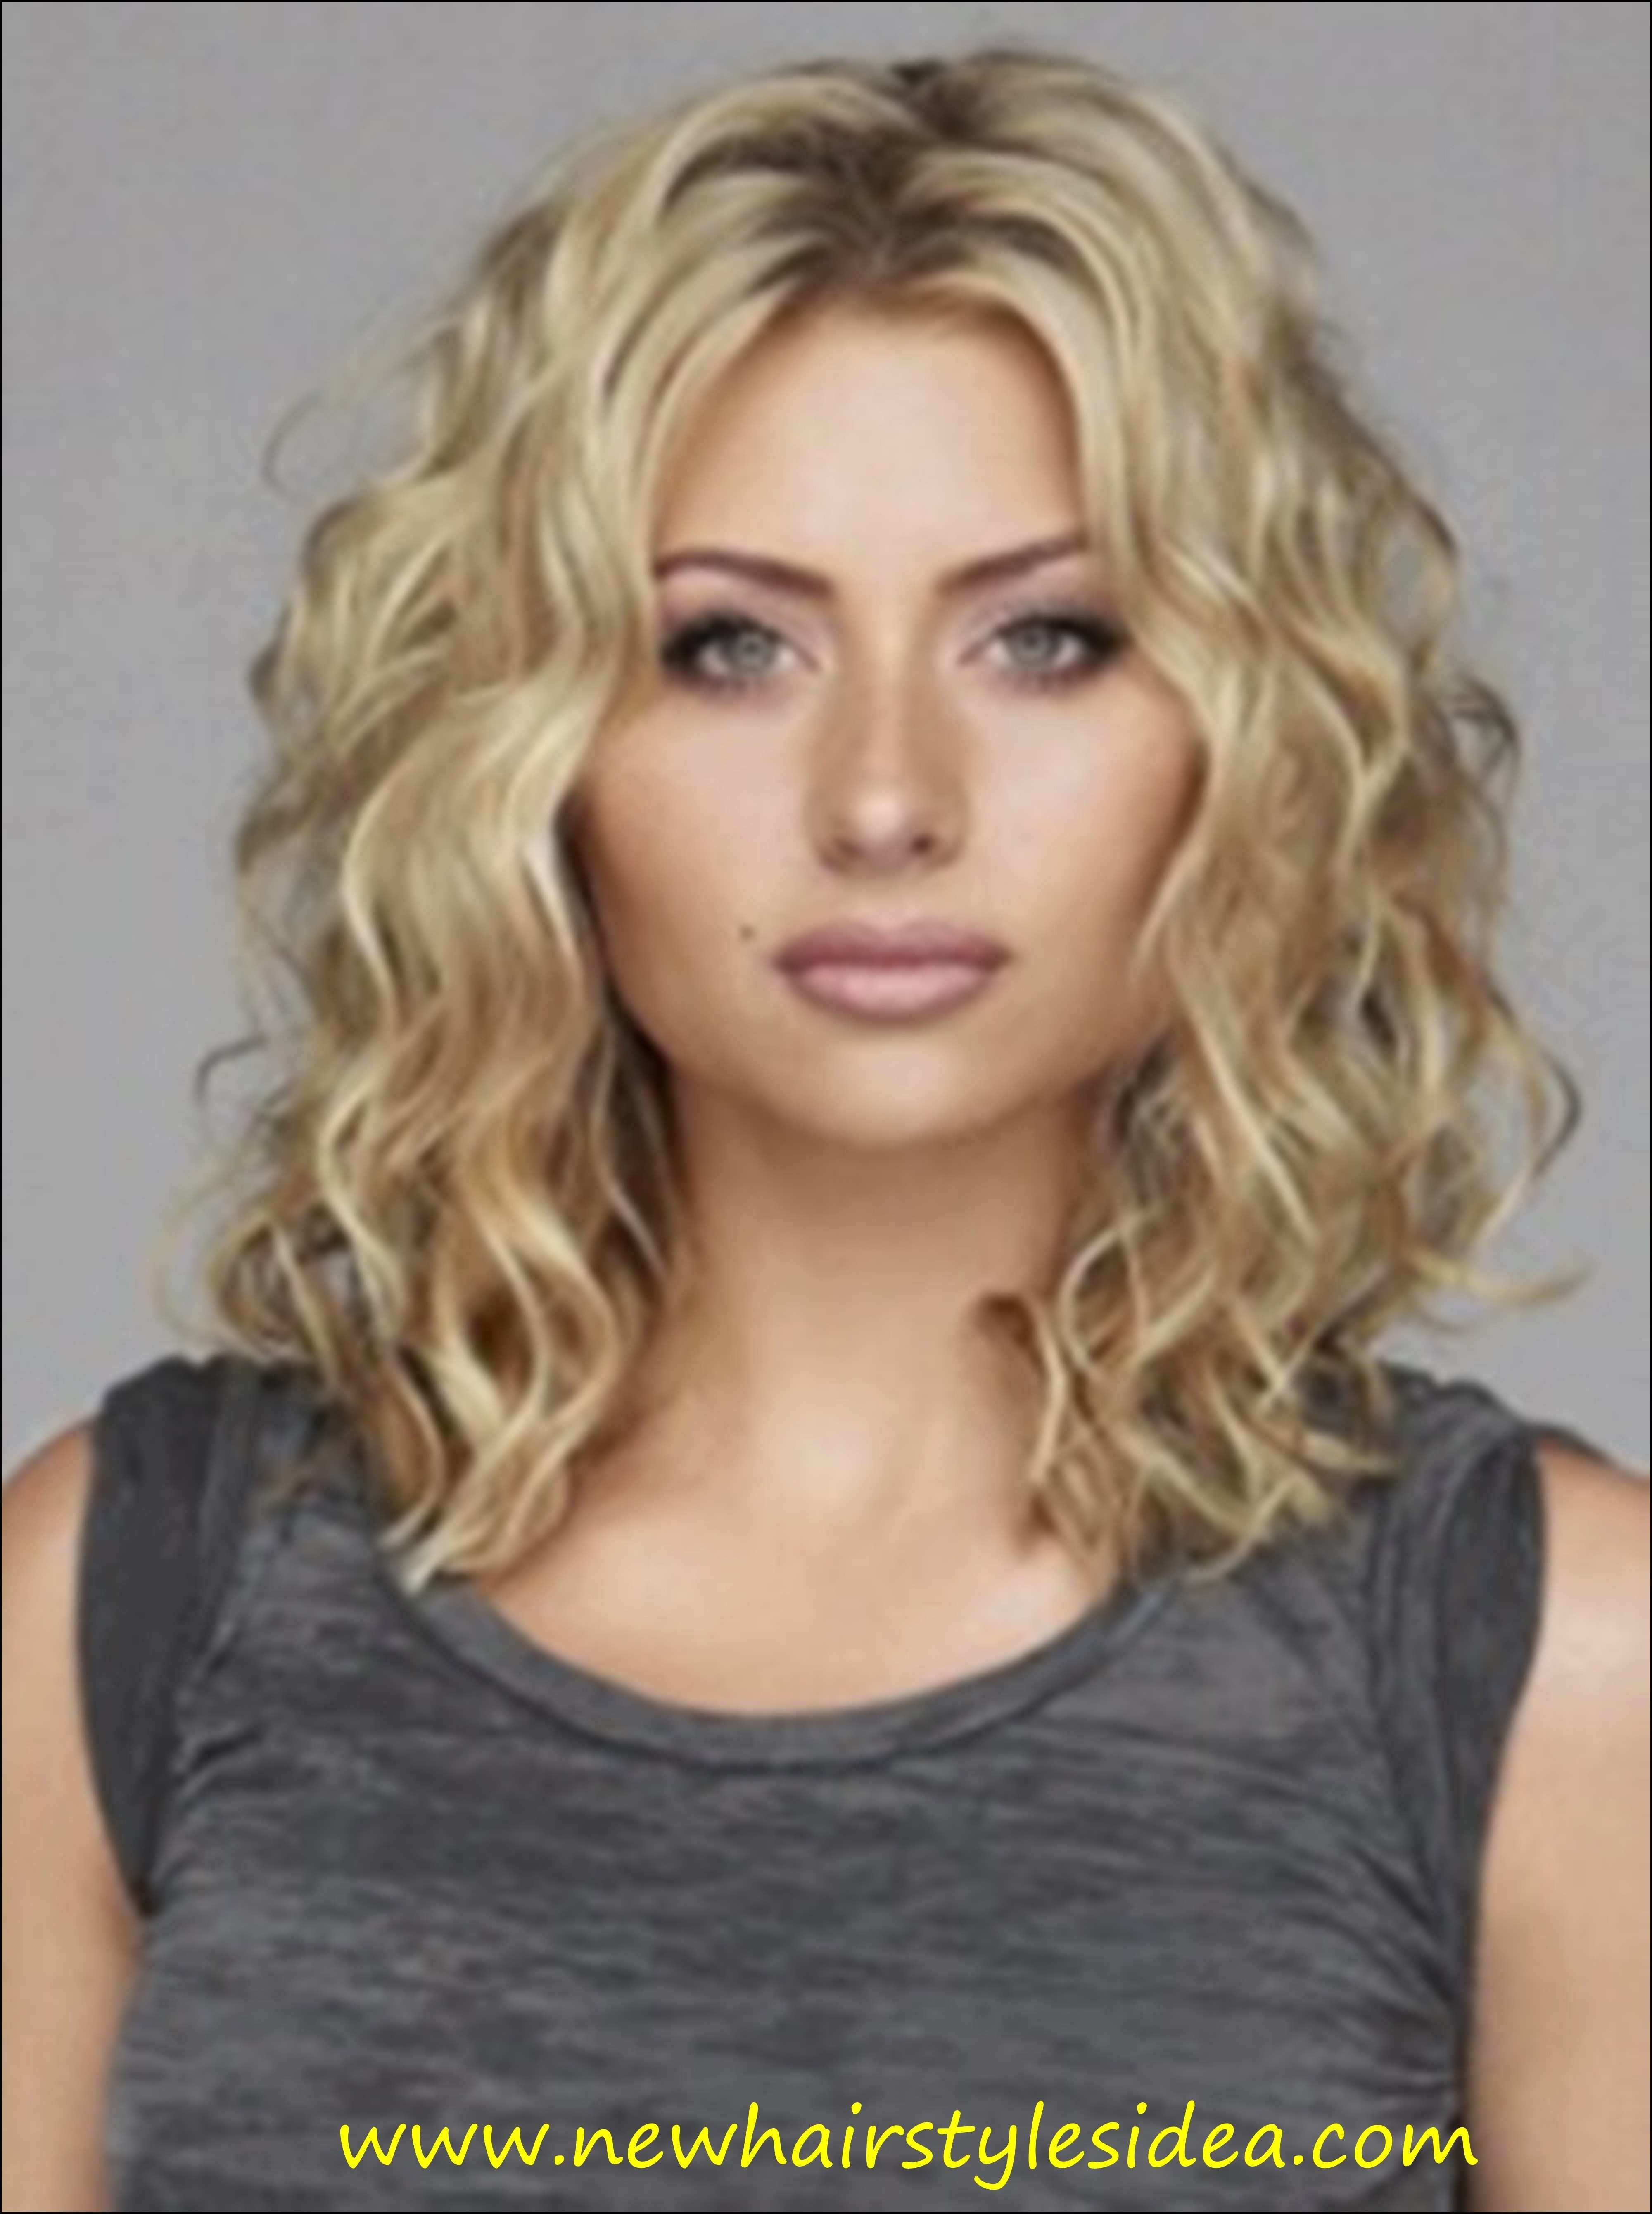 Loose Curl Hairstyles For Medium Hair Lovely Loose Curls Hairstyles For Medium Length Hair Hairstyles Medium Curly Hair Styles Hair Styles Curly Hair Styles